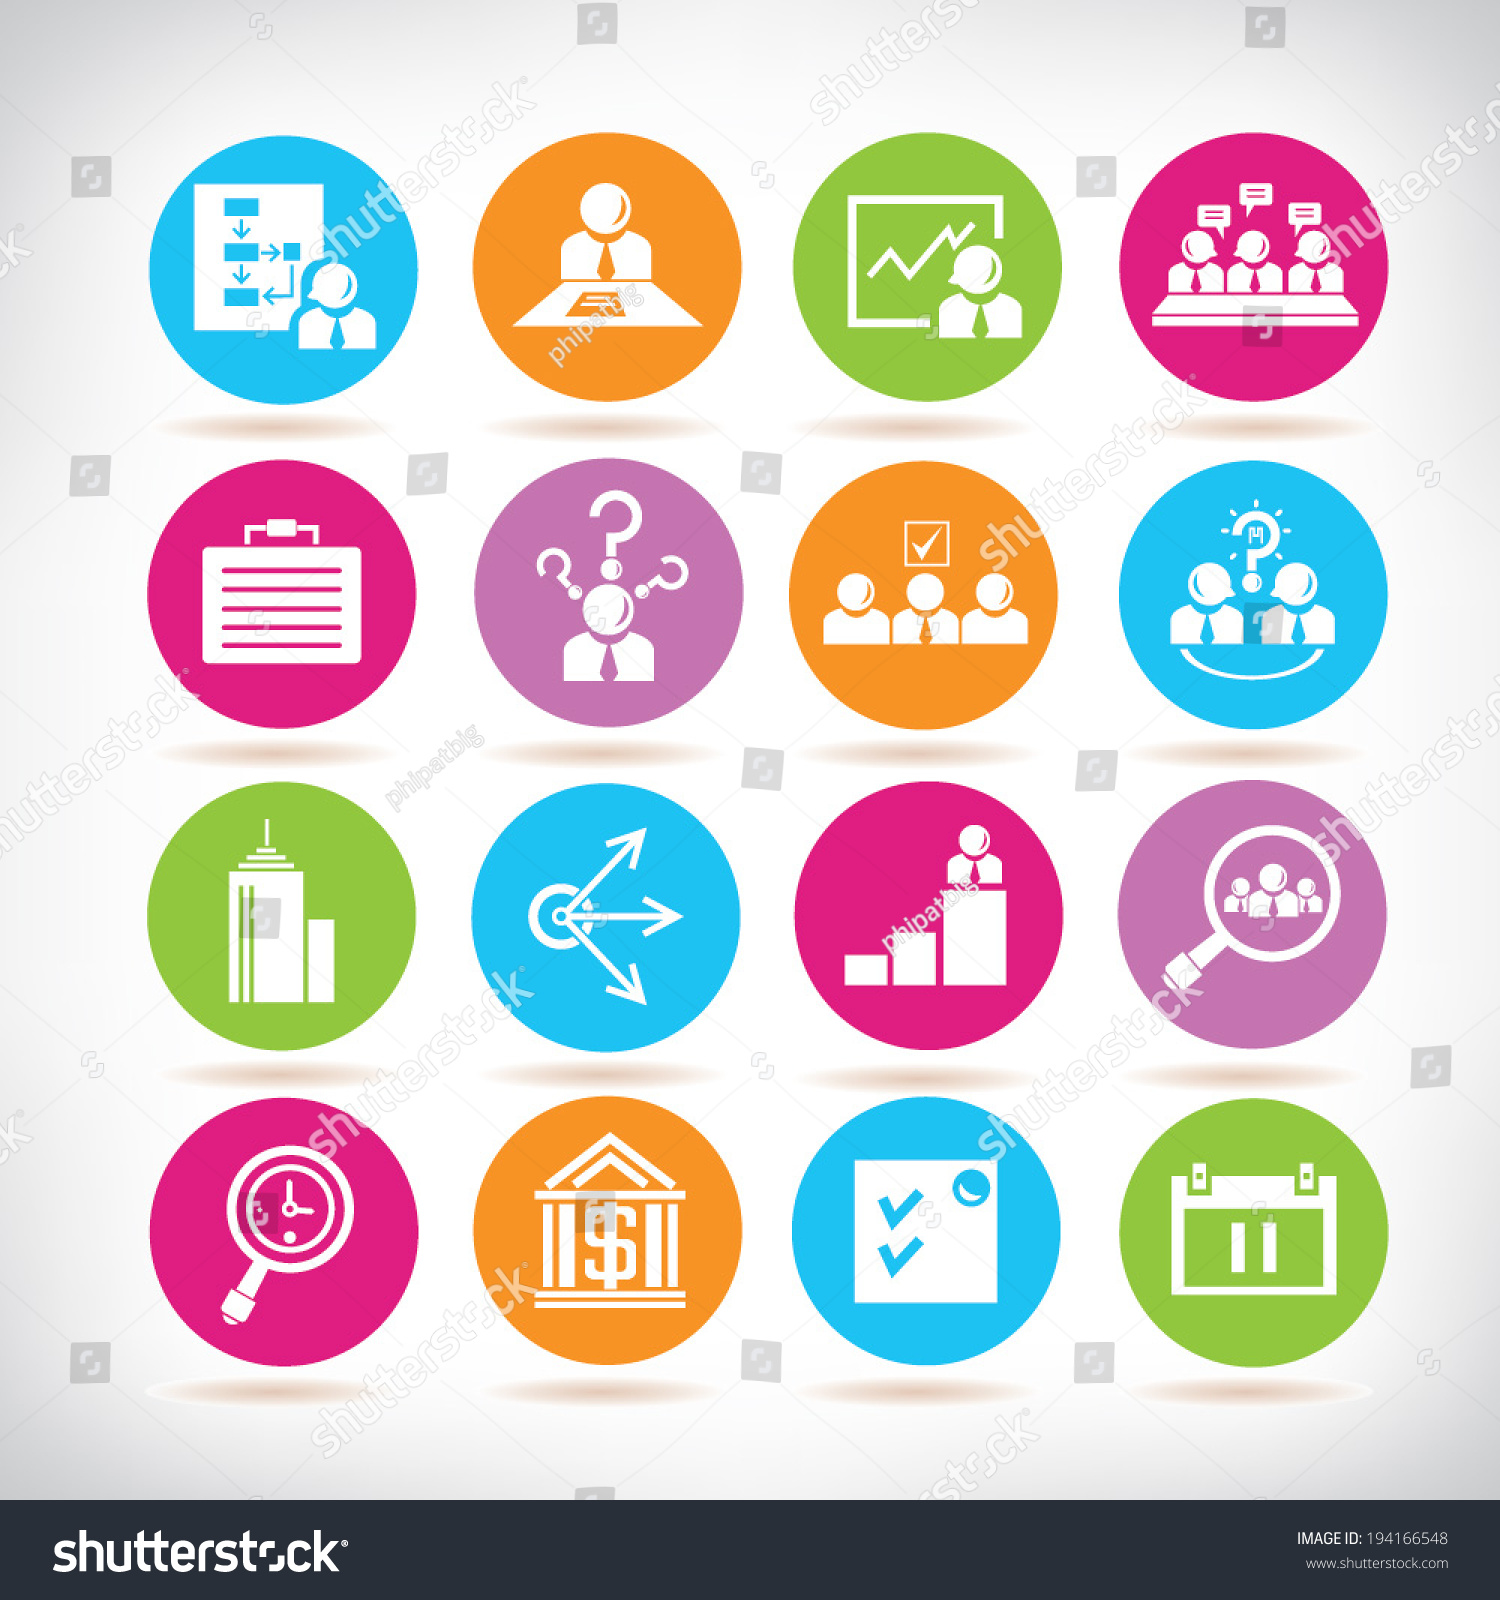 Business Development Icon : Business development icons management stock